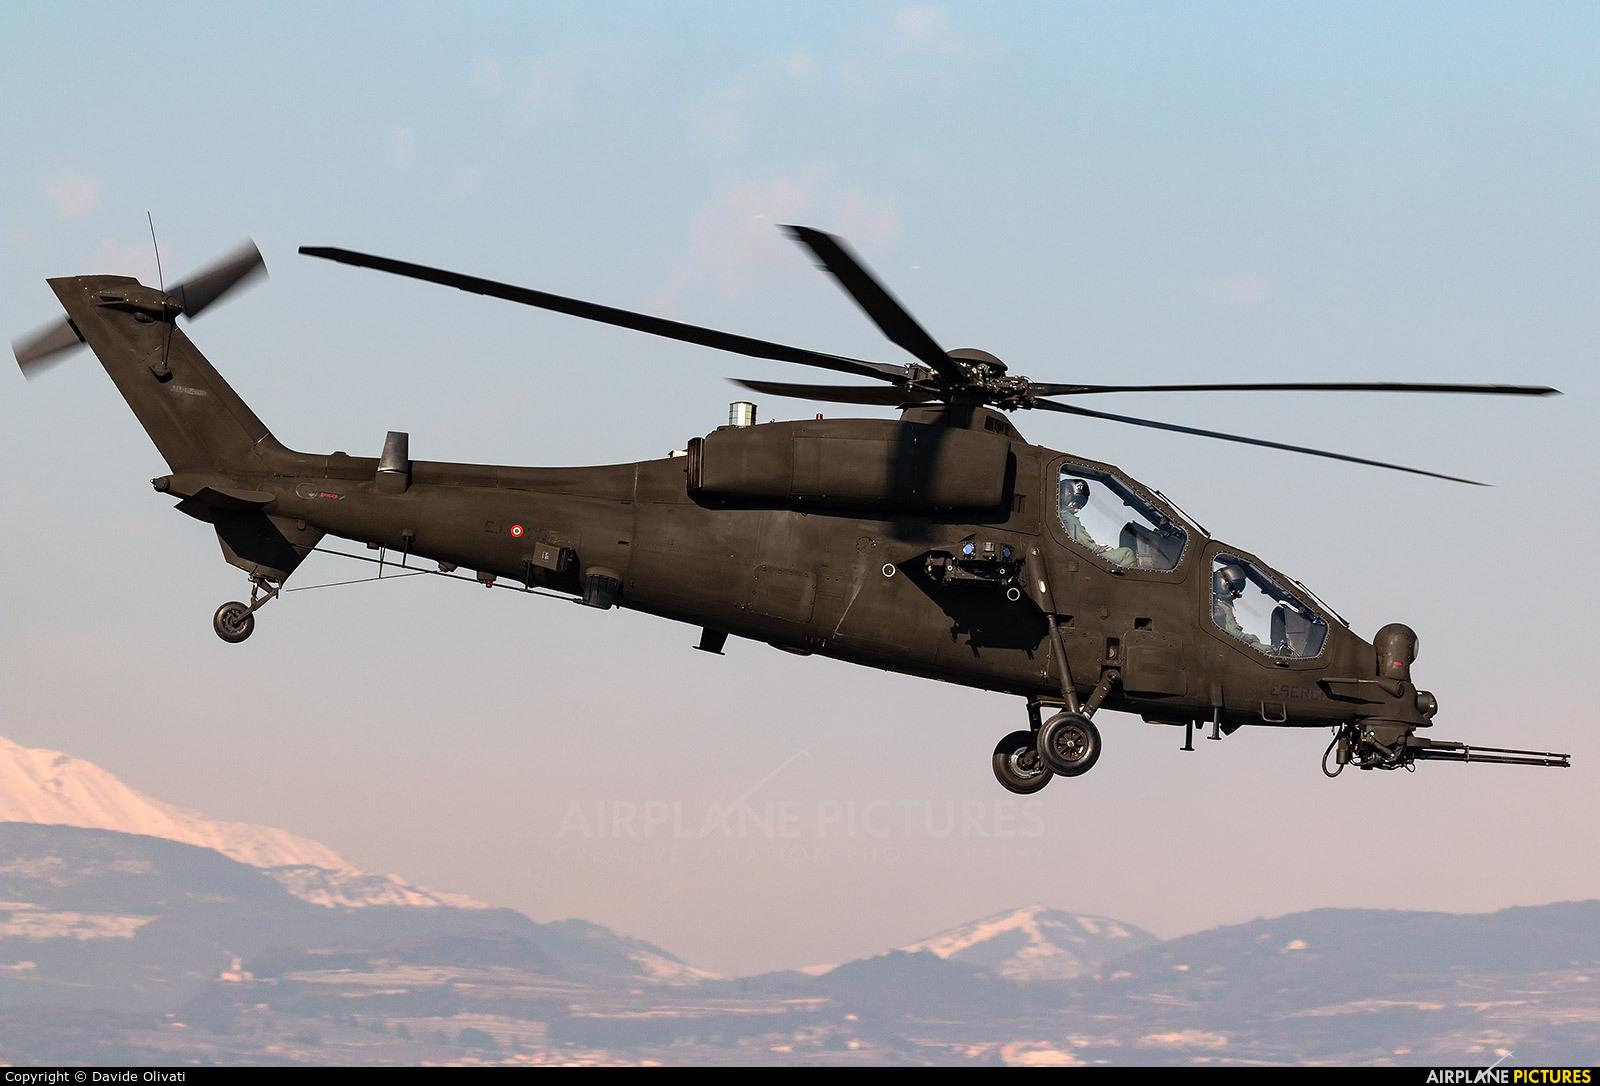 Italy - Army MM81425 aircraft at Verona - Boscomantico